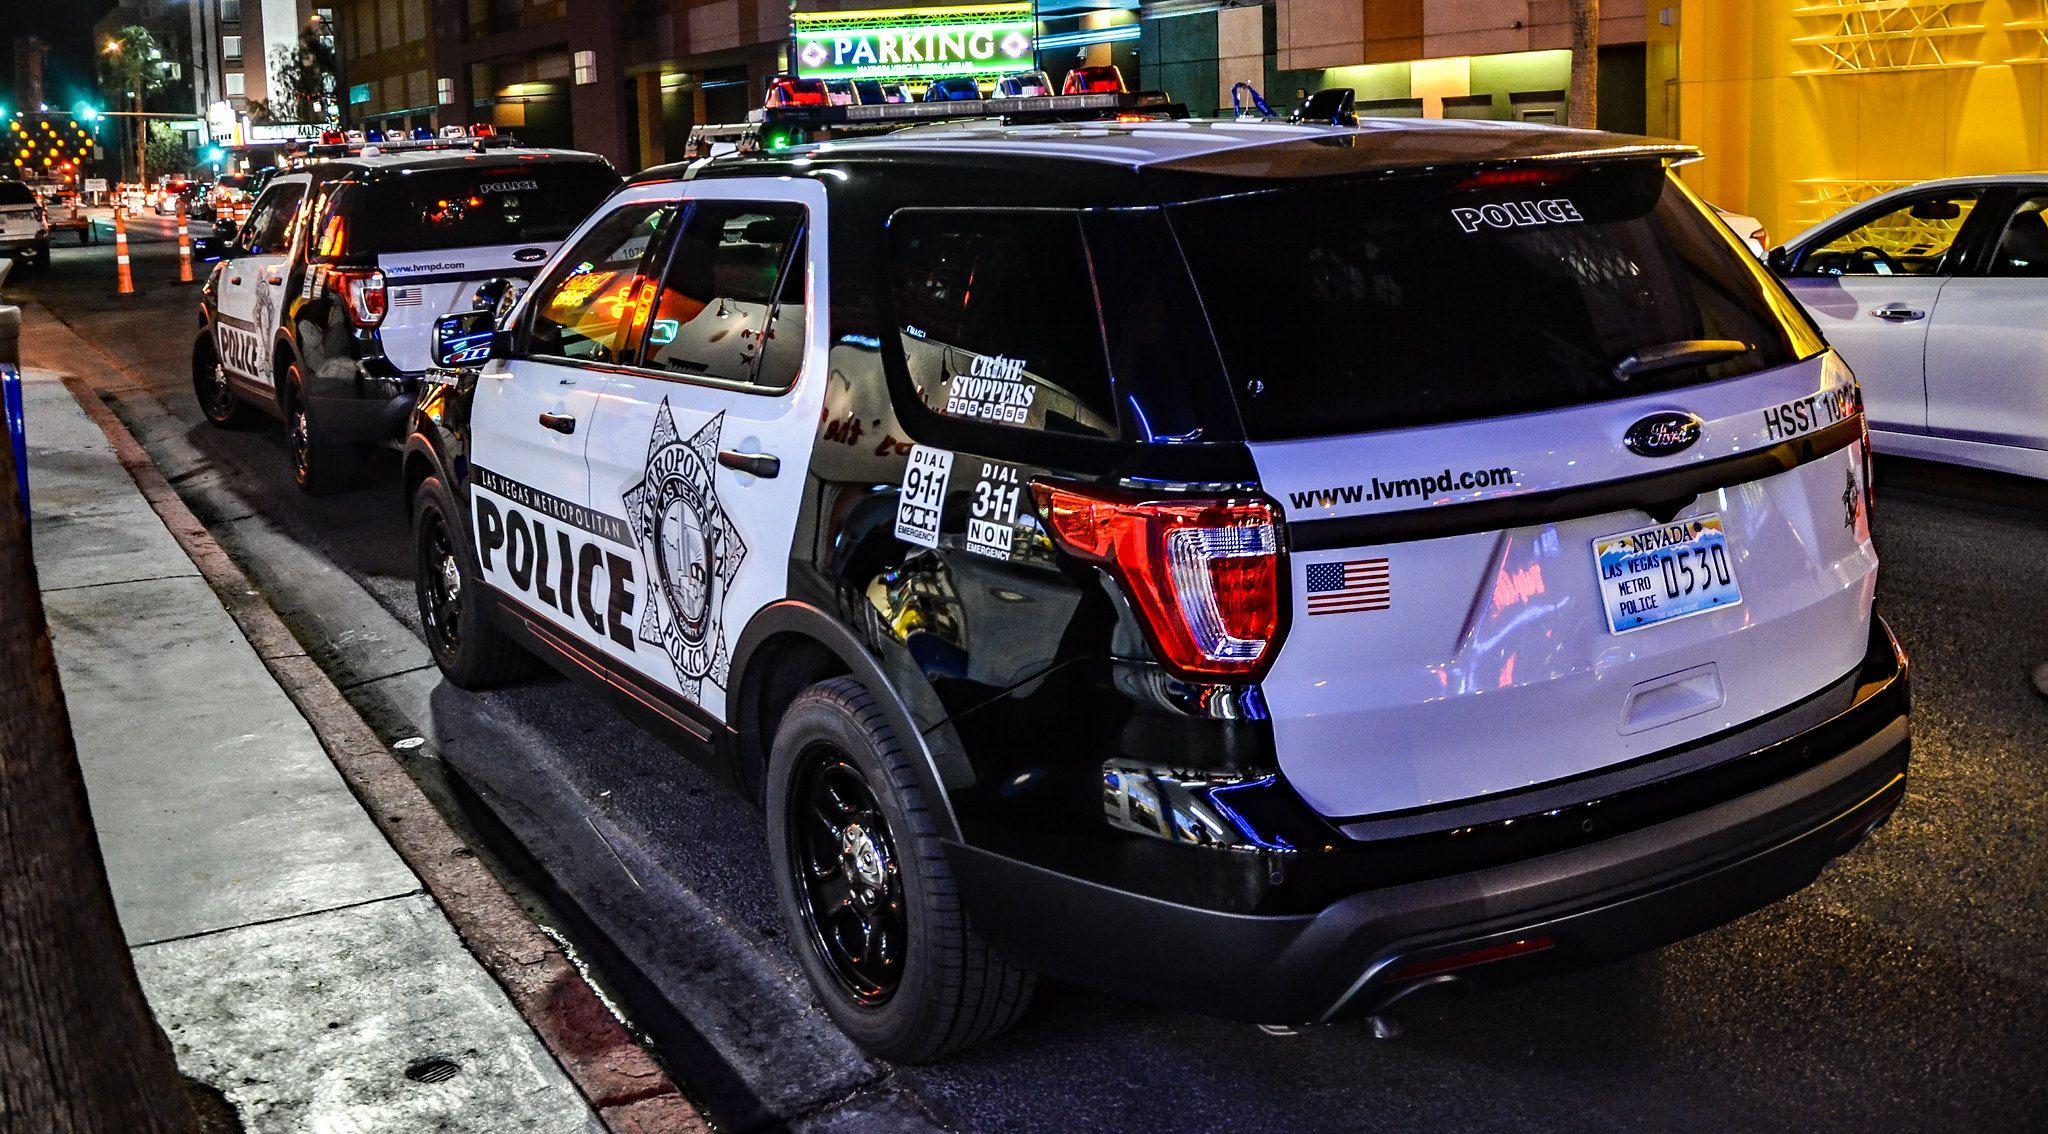 65 Las Vegas Metropolitan Police Department Ideas In 2021 Police Police Department Las Vegas